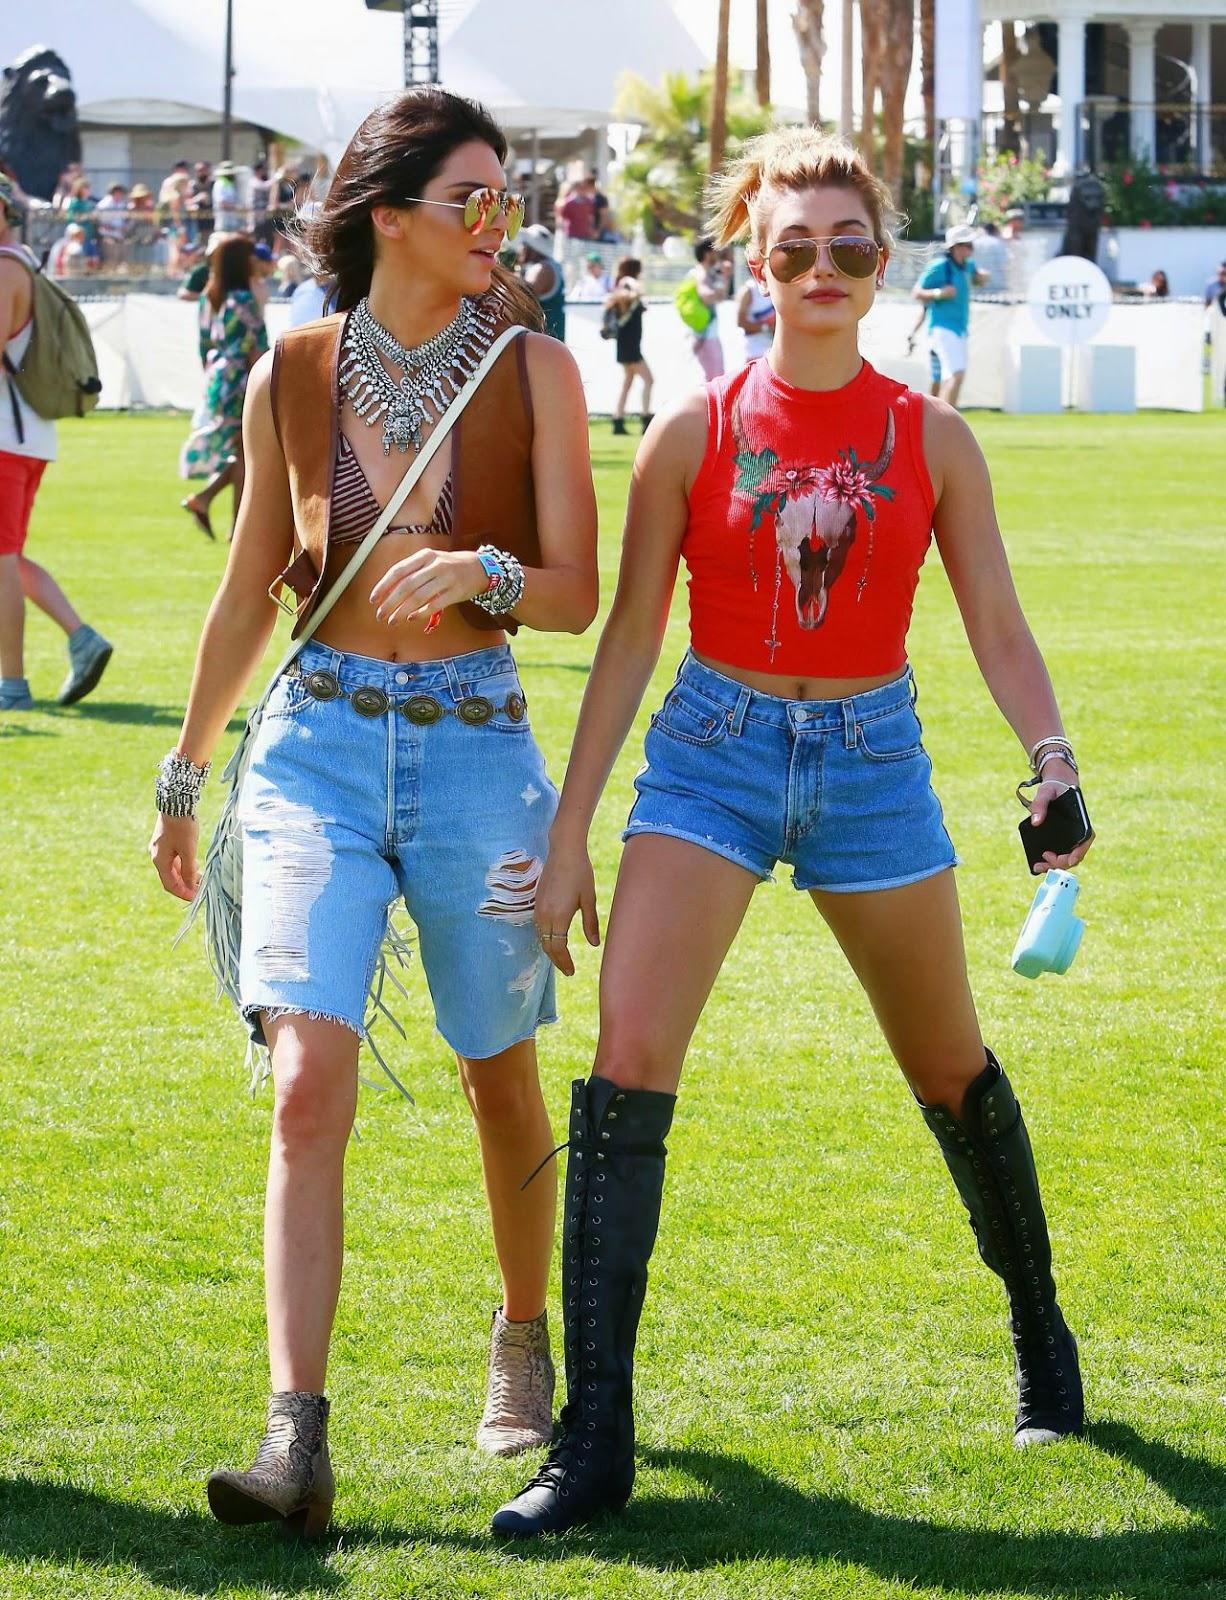 Kendall & Kylie Jenner, Hailey Baldwin – 2015 Coachella Music Festival in Indio – Day 1